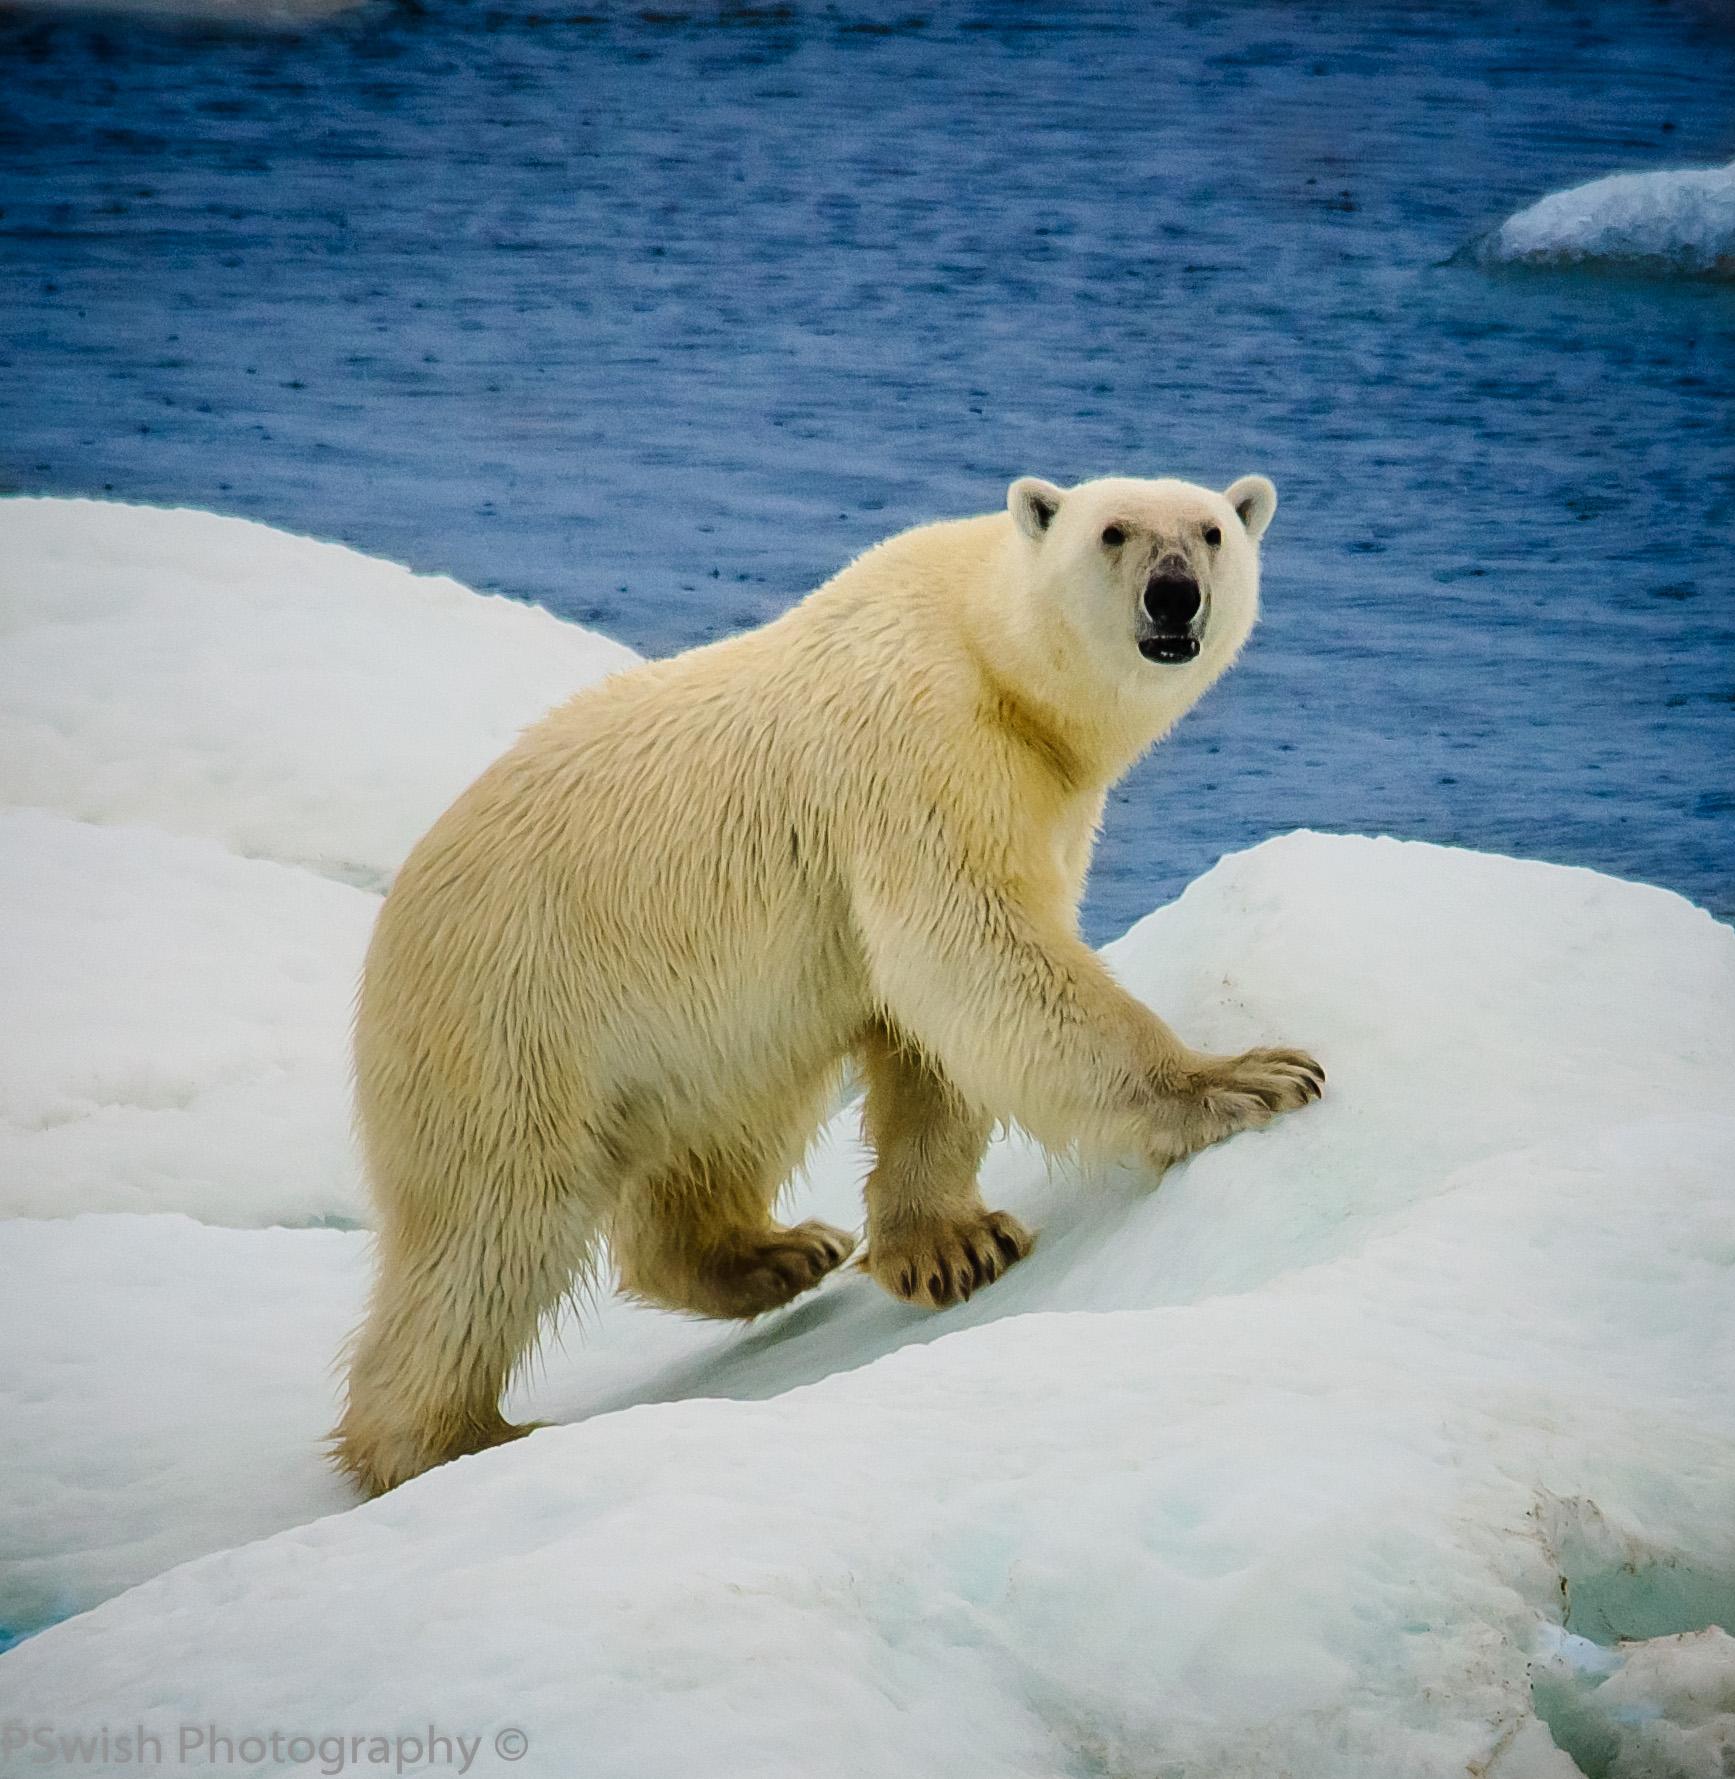 First Polar bear sighting in the wild.